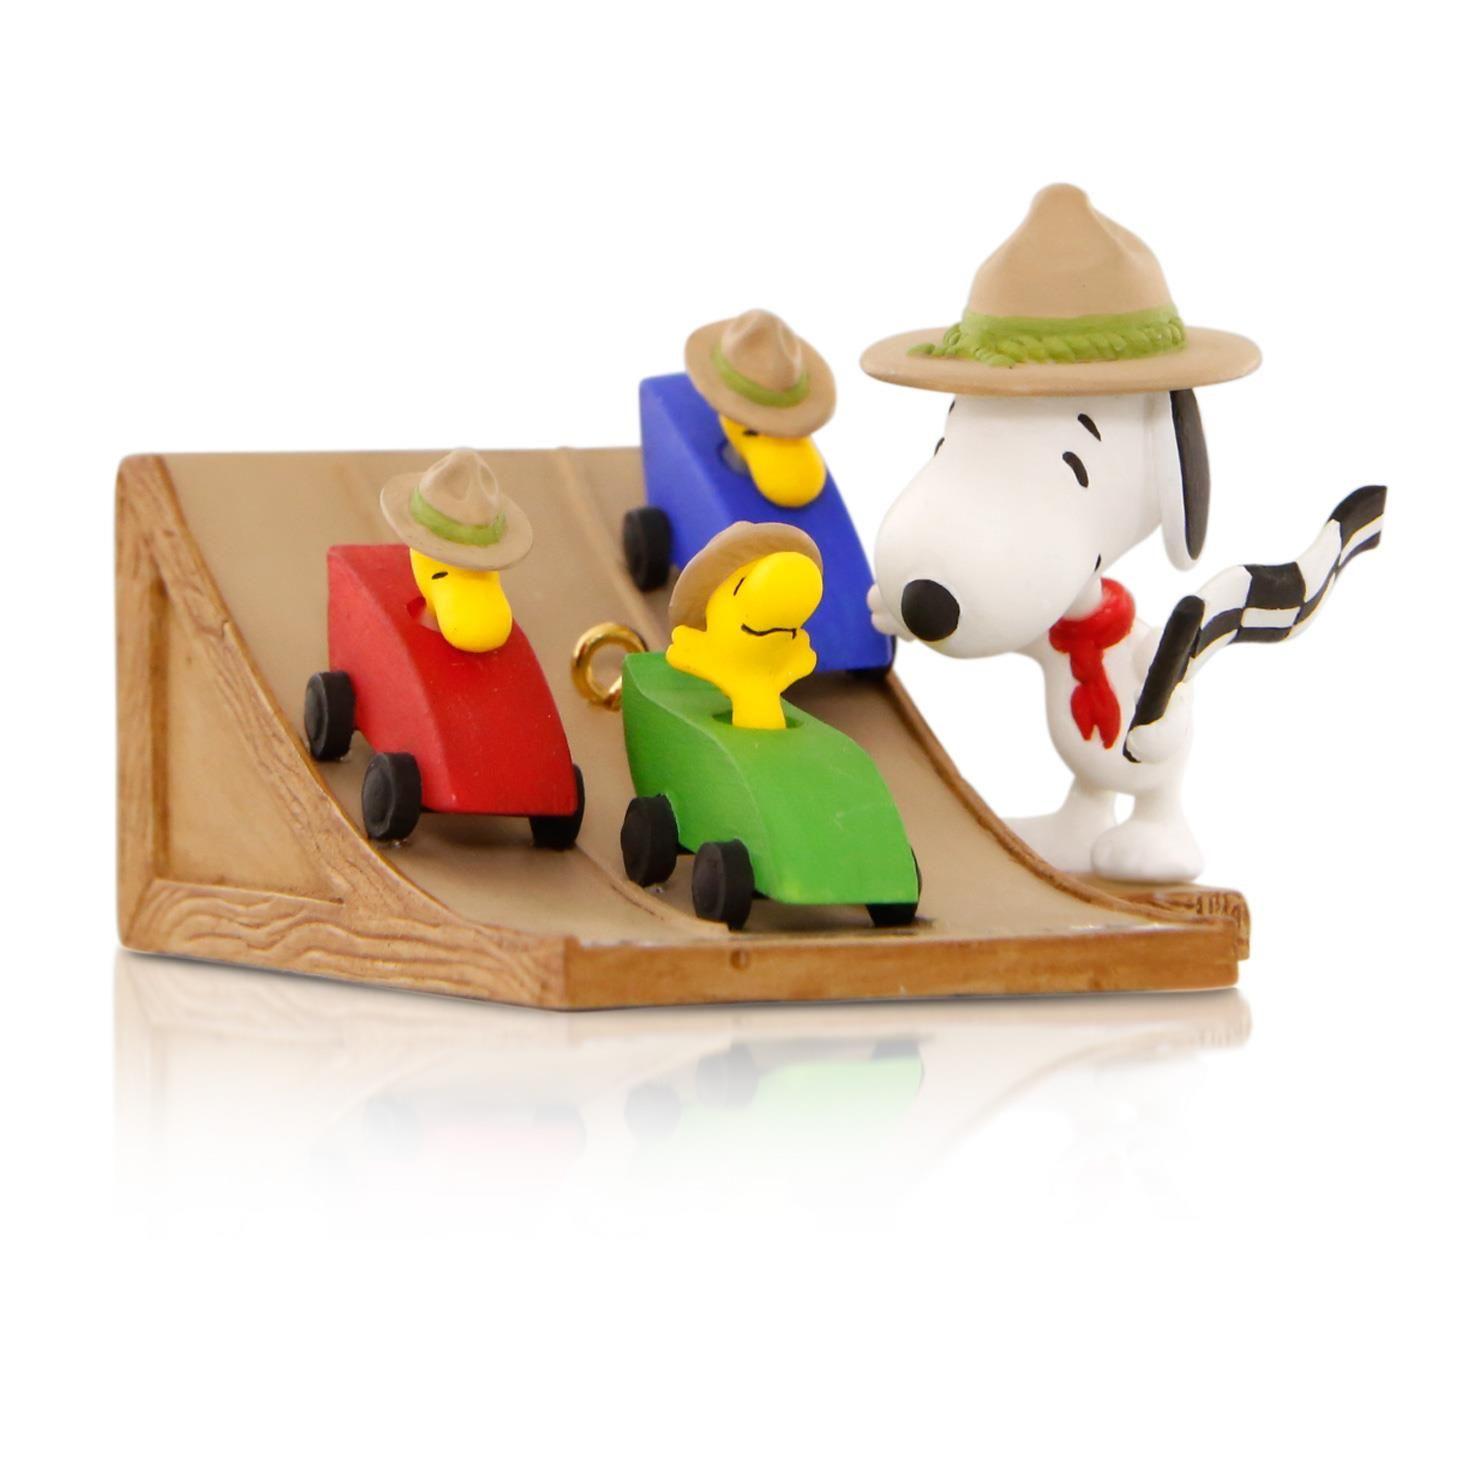 Snoopy Christmas Tree Topper: 2015 The Race Is On Hallmark Keepsake Ornament